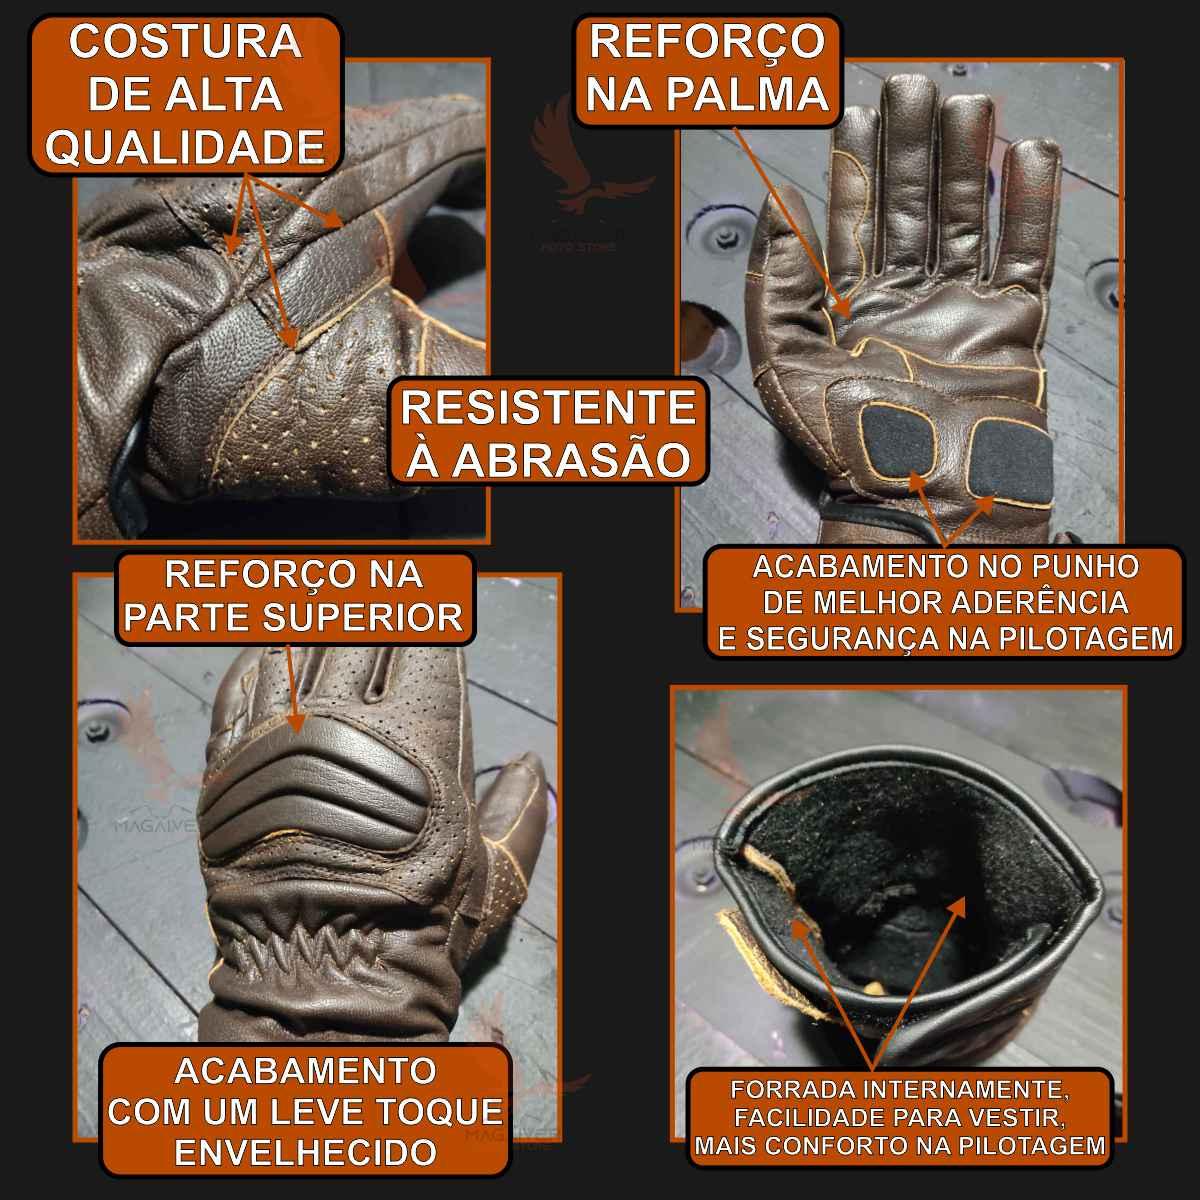 LUVA DE COURO PERFURADO HLX RACING CANO CURTO PARA MOTOCICLISTAS MODELO SPIRIT CONFORT